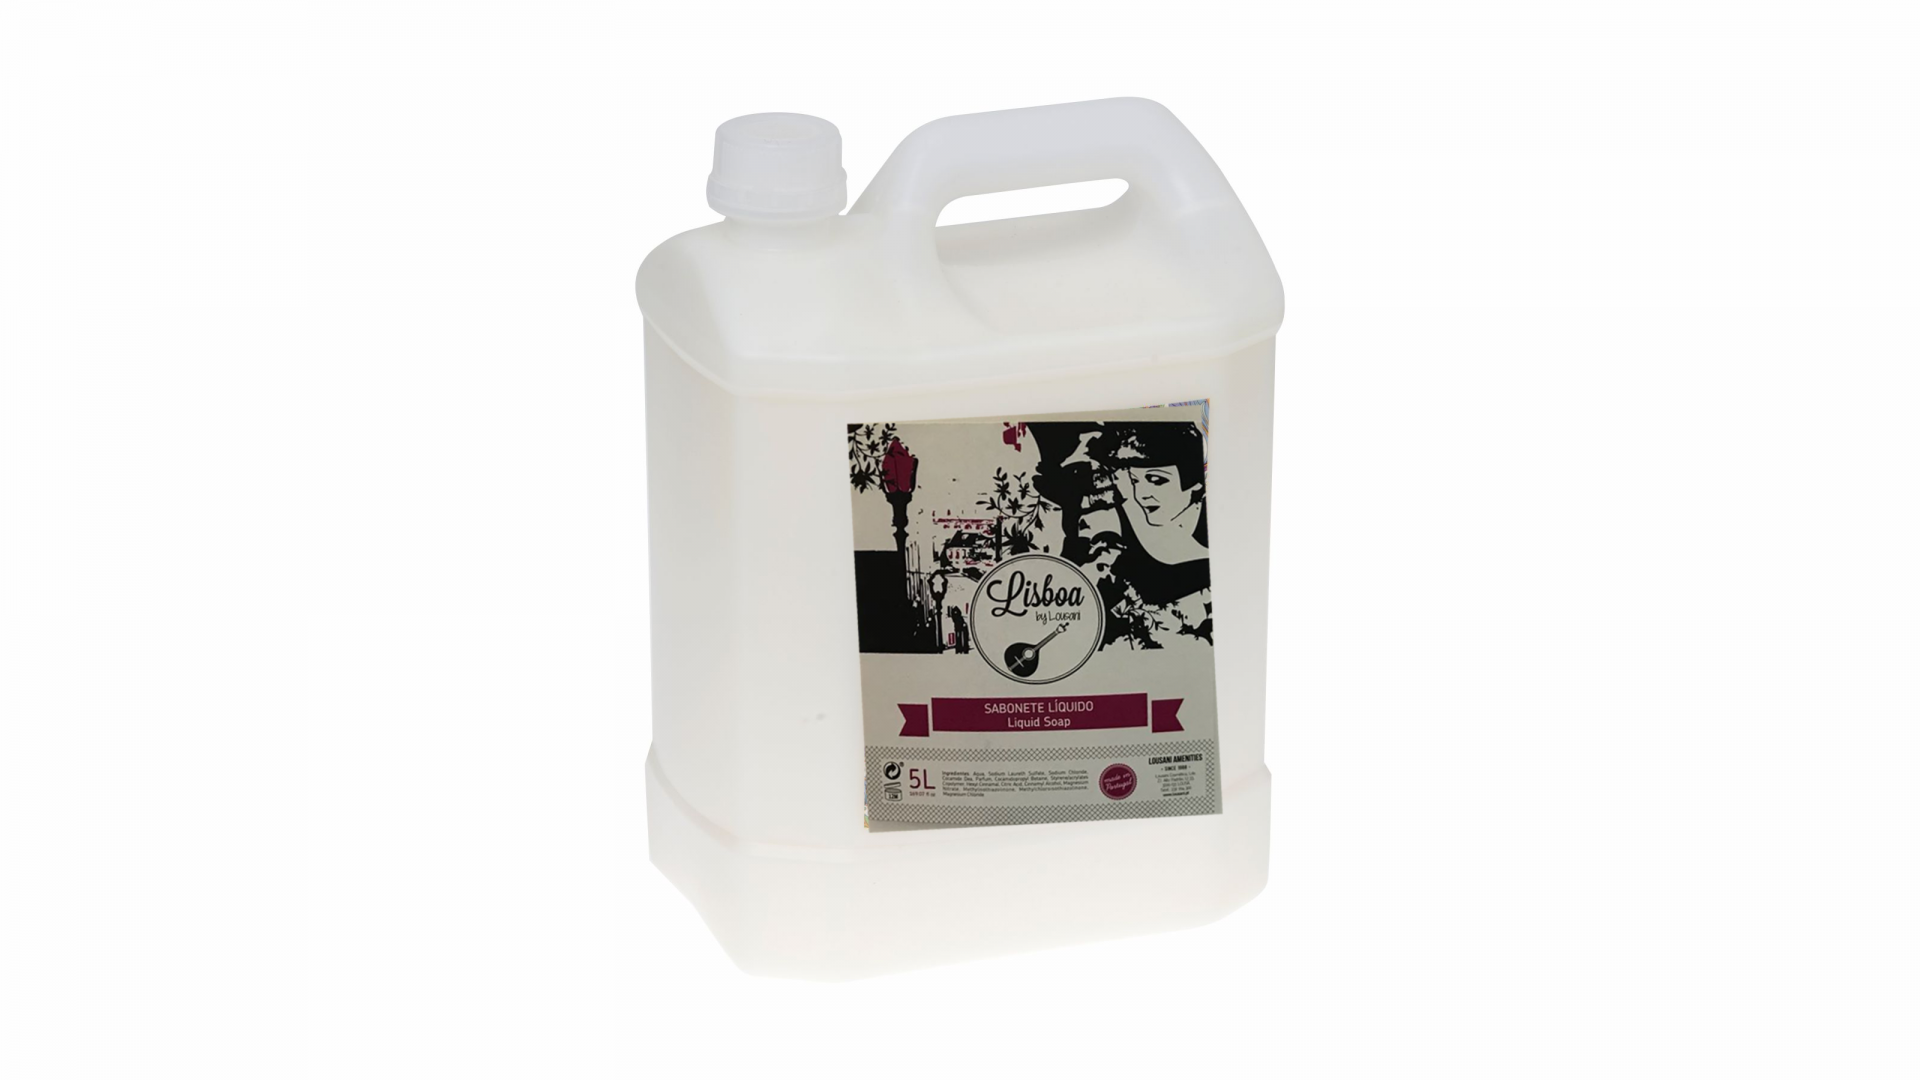 Recarga 5L sabonete líquido (1 uni) - Gama Lisboa